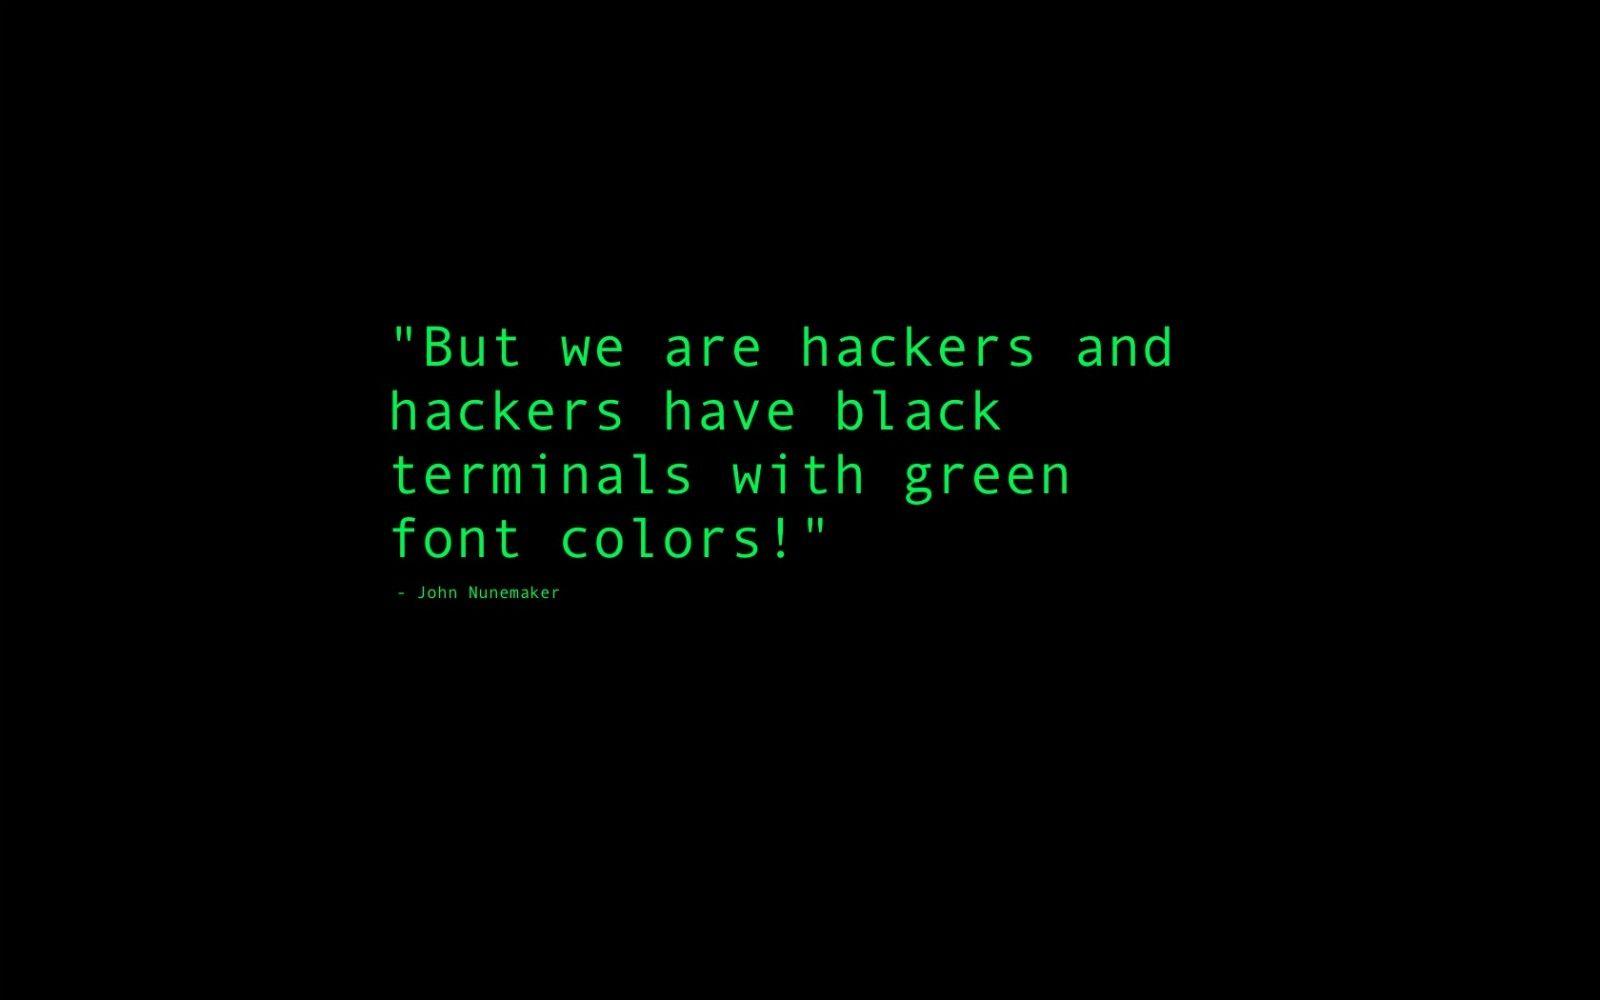 Обои hacked, hack, Hacker. Минимализм foto 13